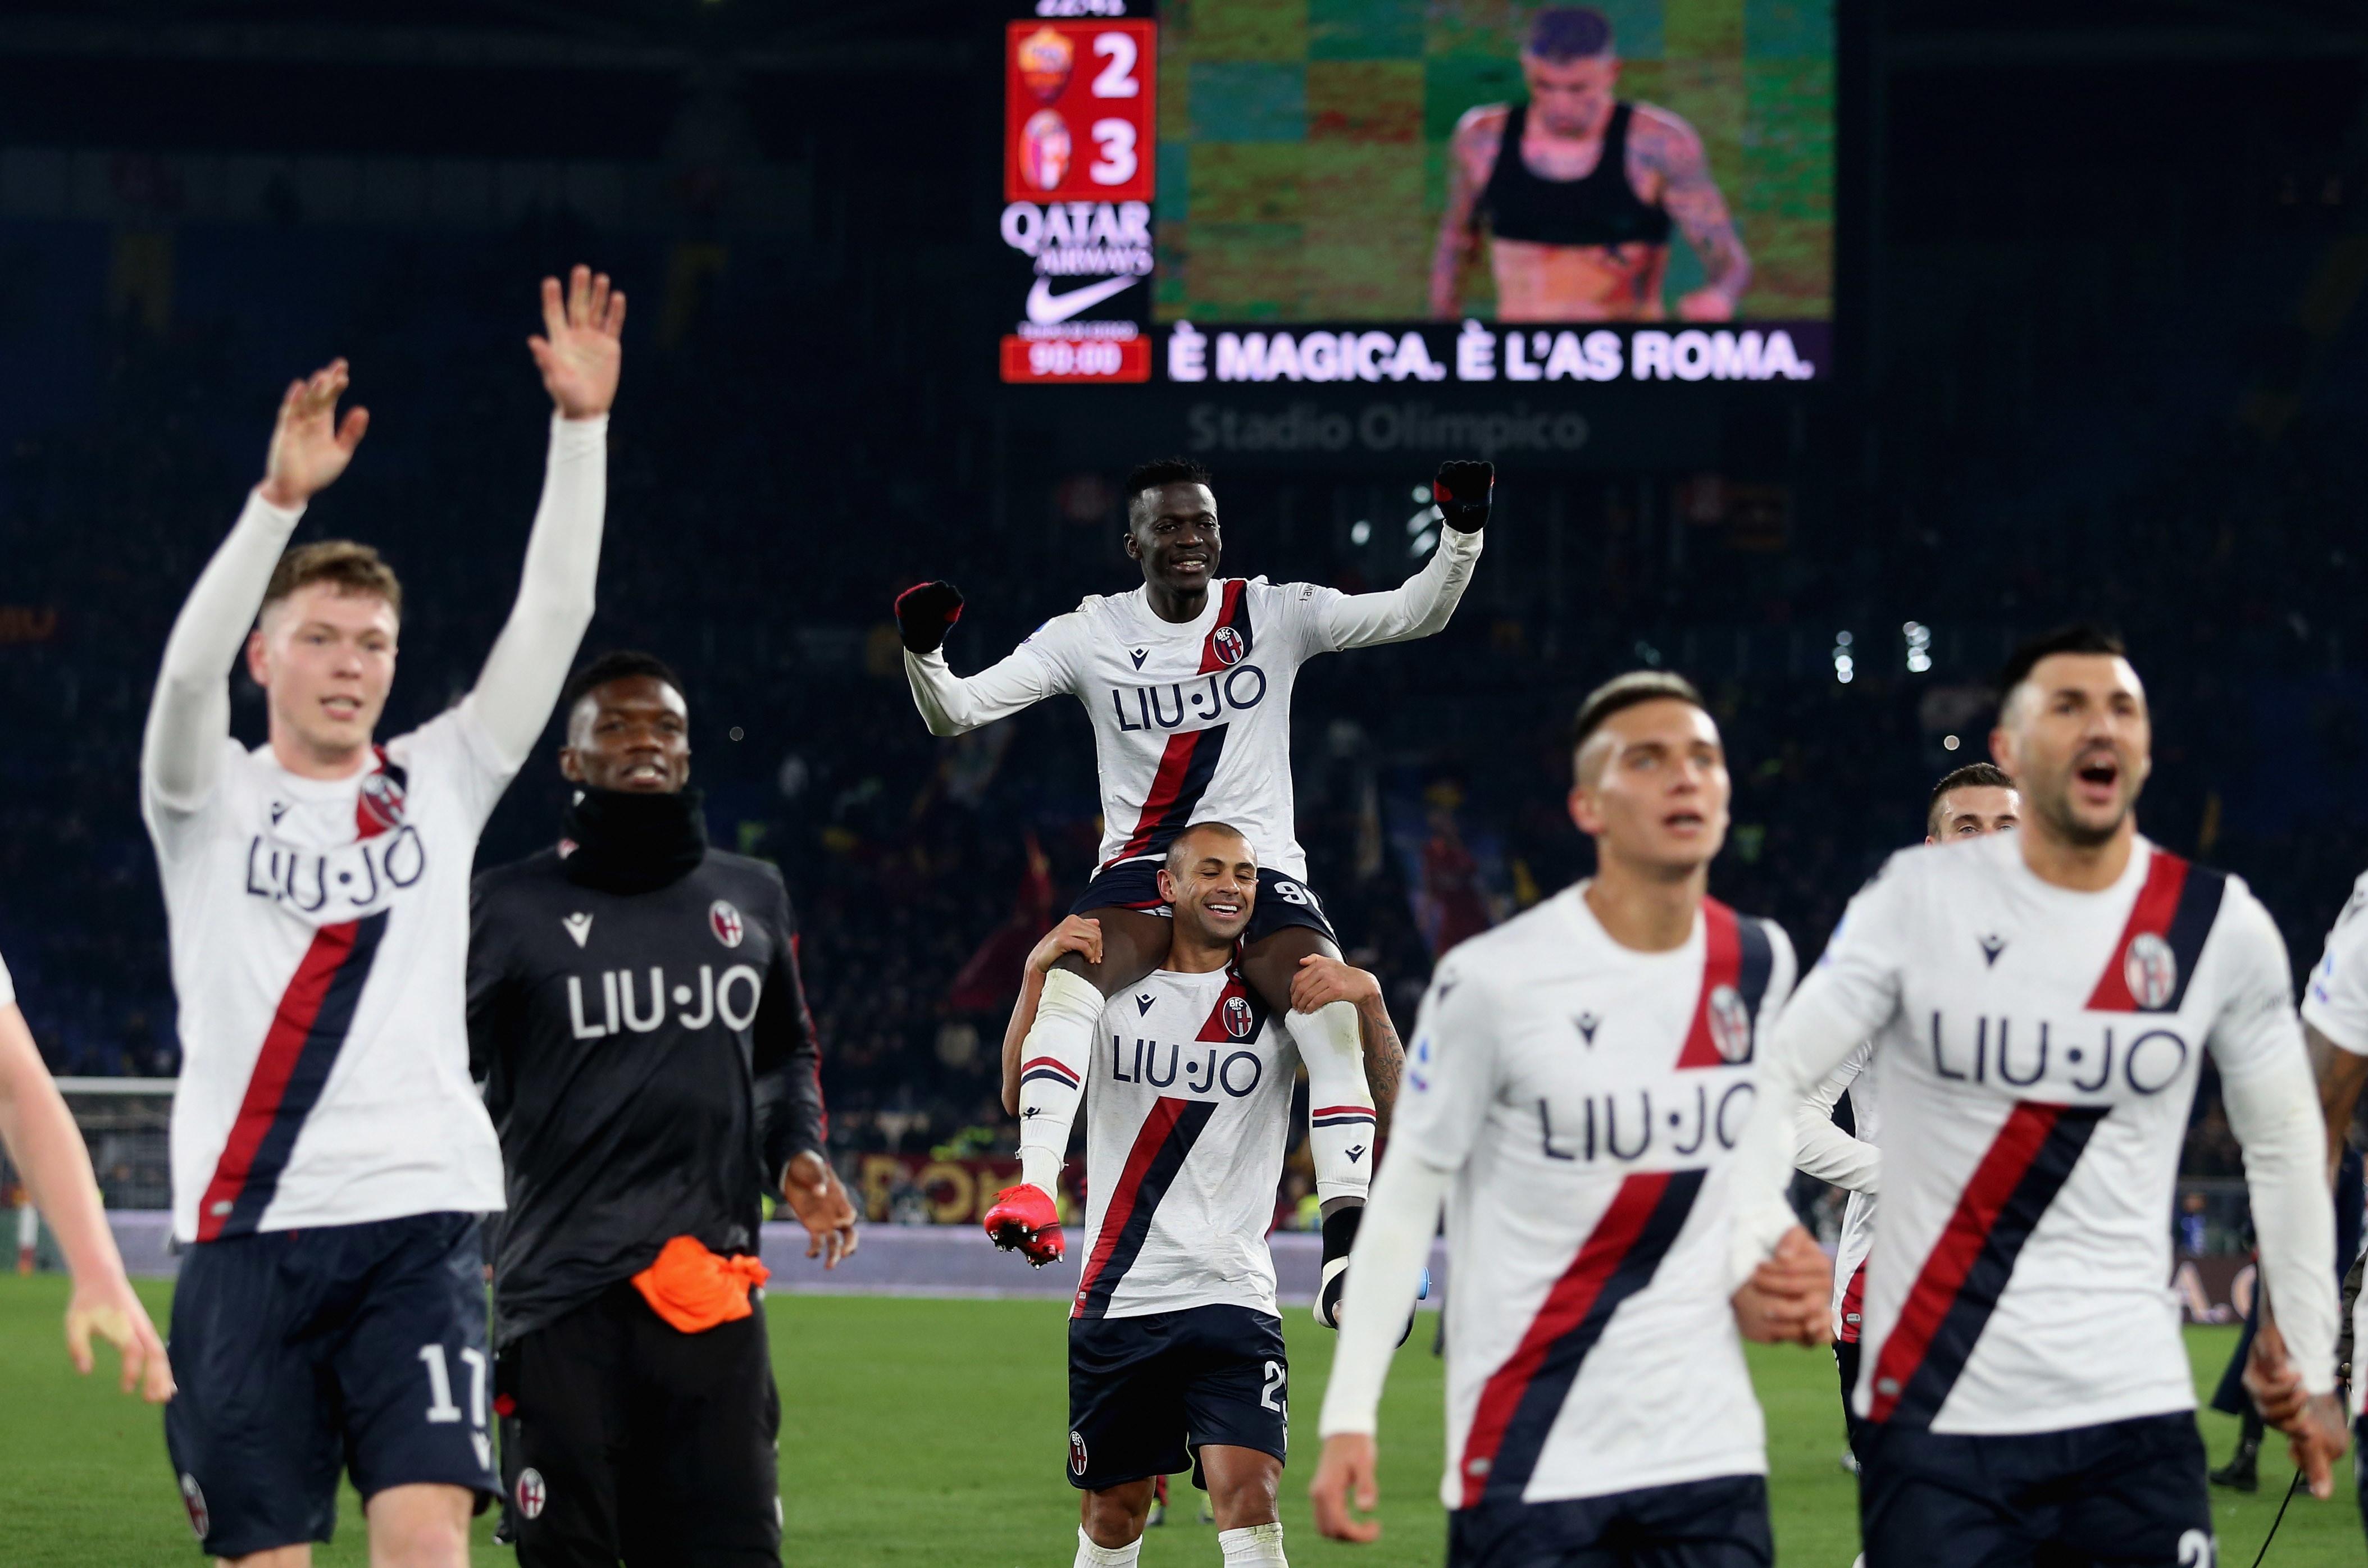 16) Bologna -71 milioni (96 spesi, 25 guadagnati)